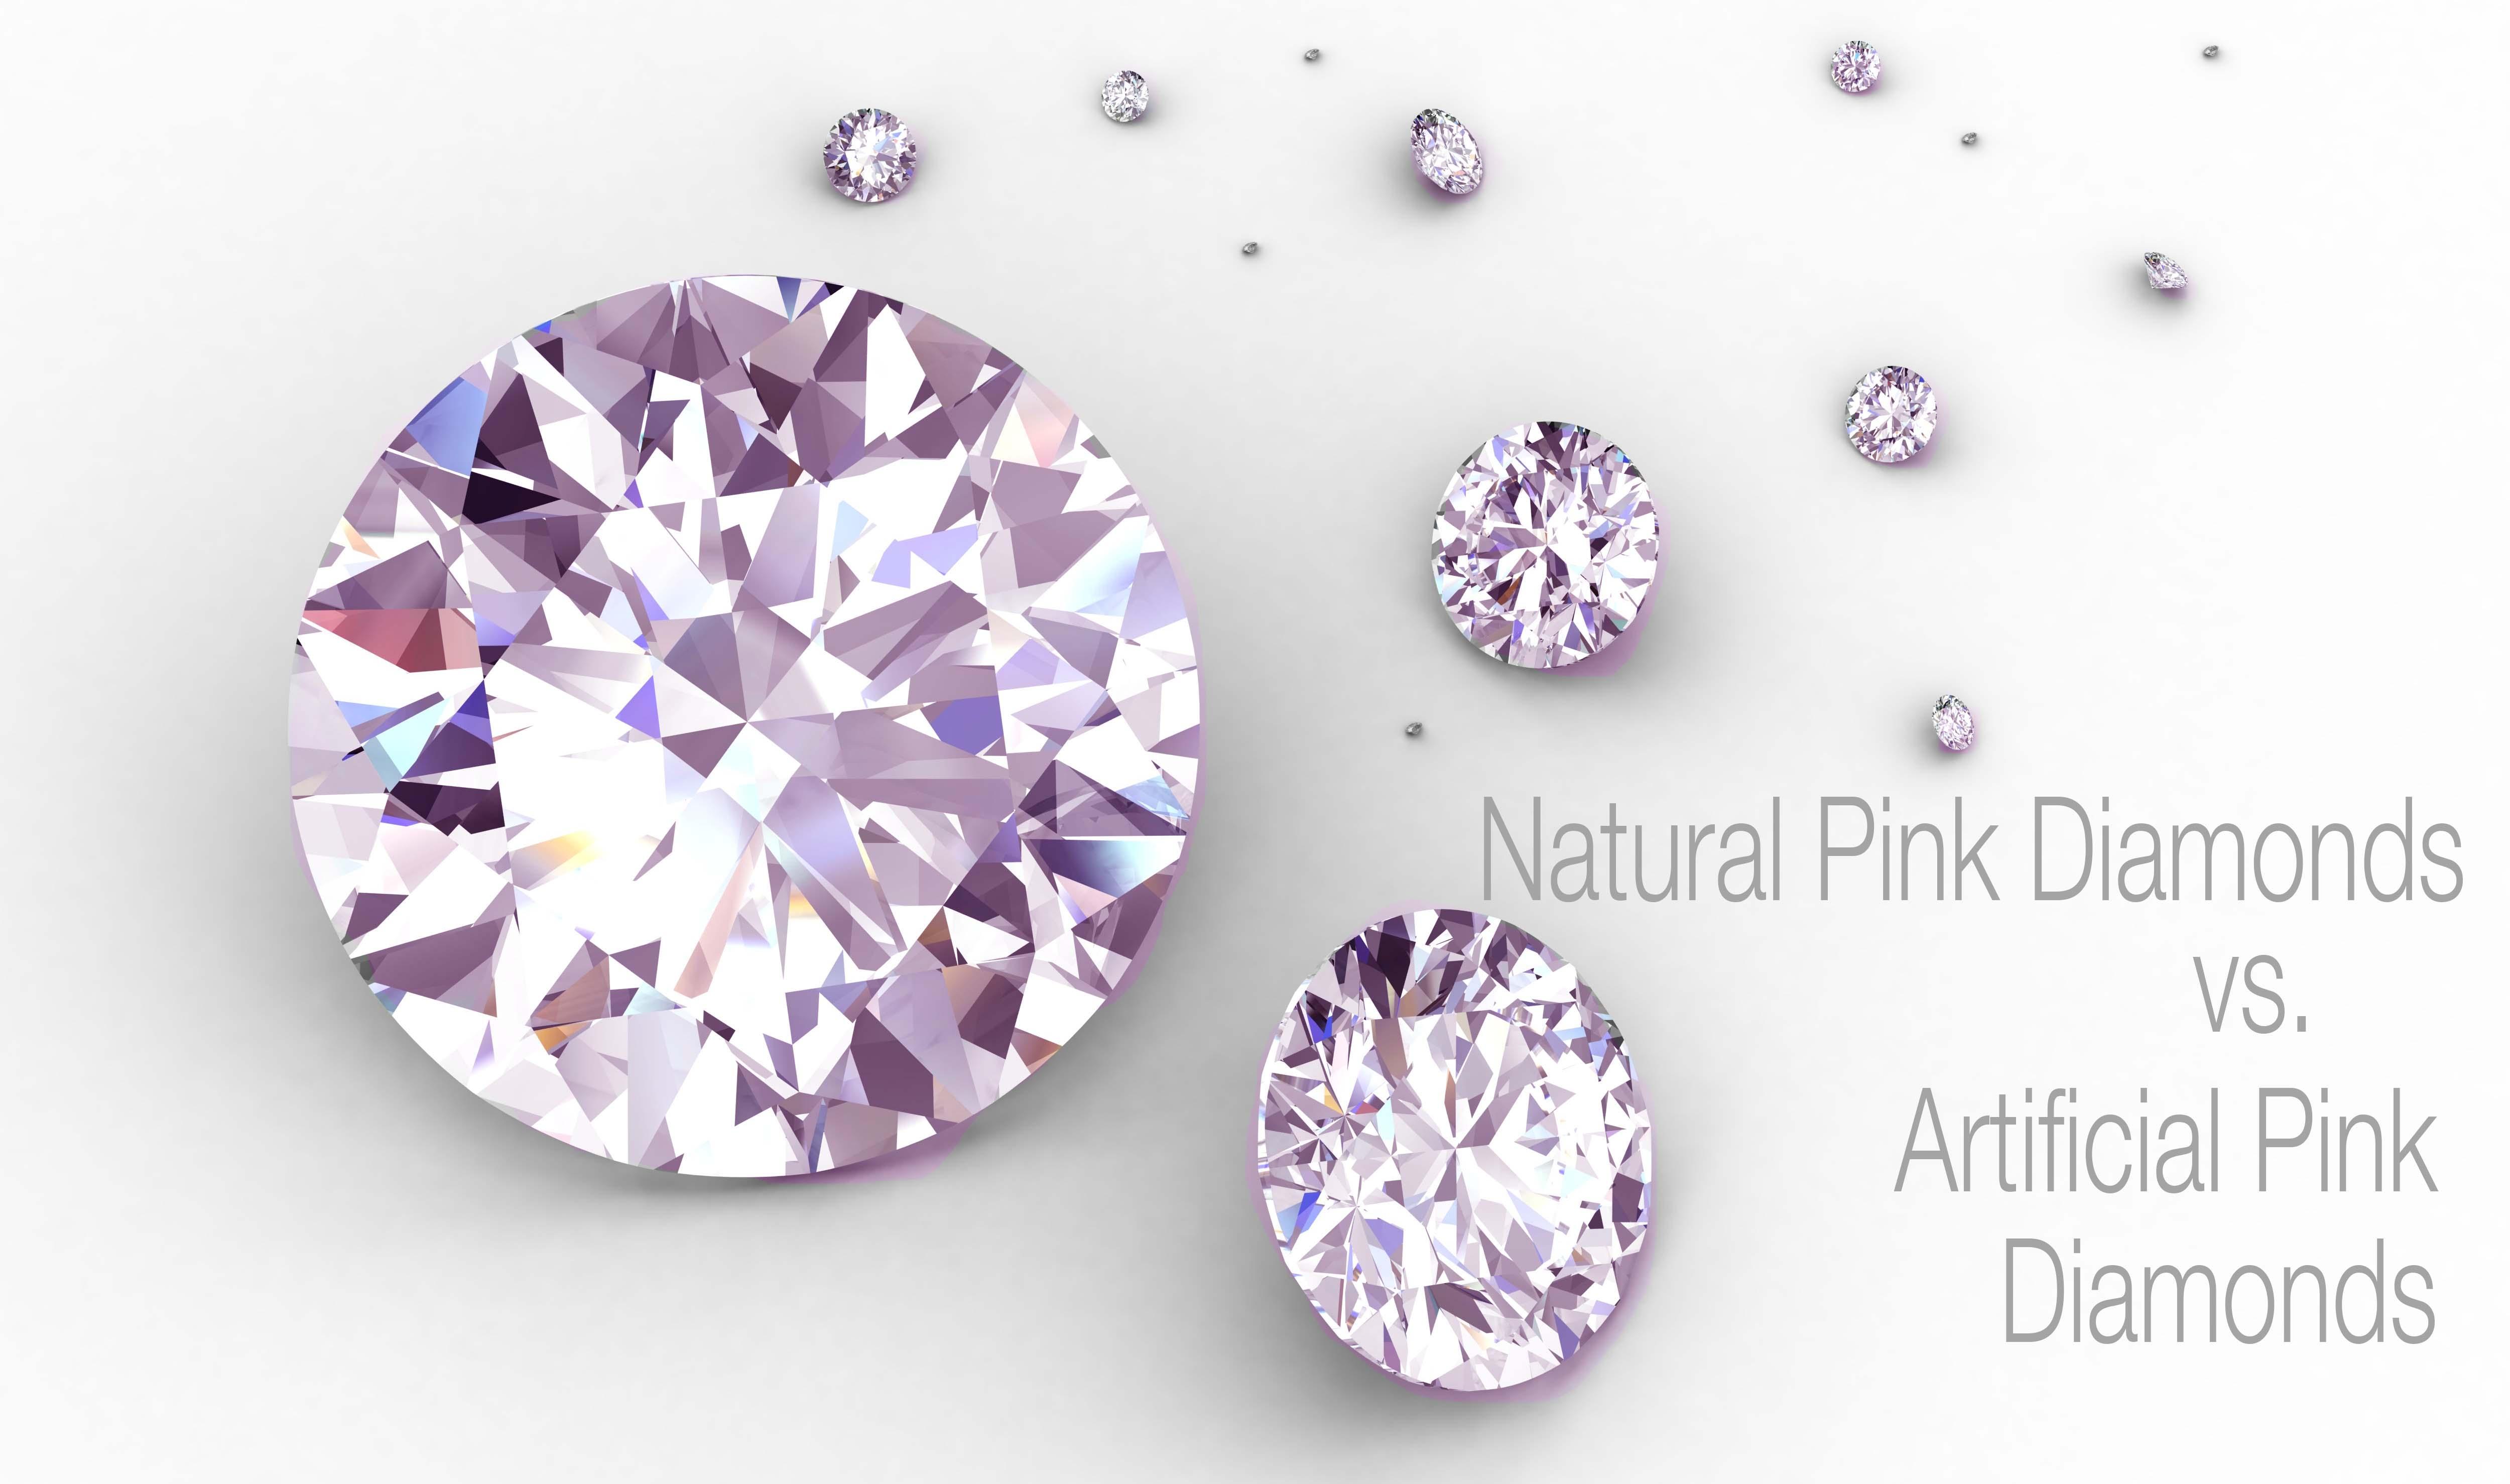 Natural Pink Diamonds Vs Artificially Colored Pink Diamonds